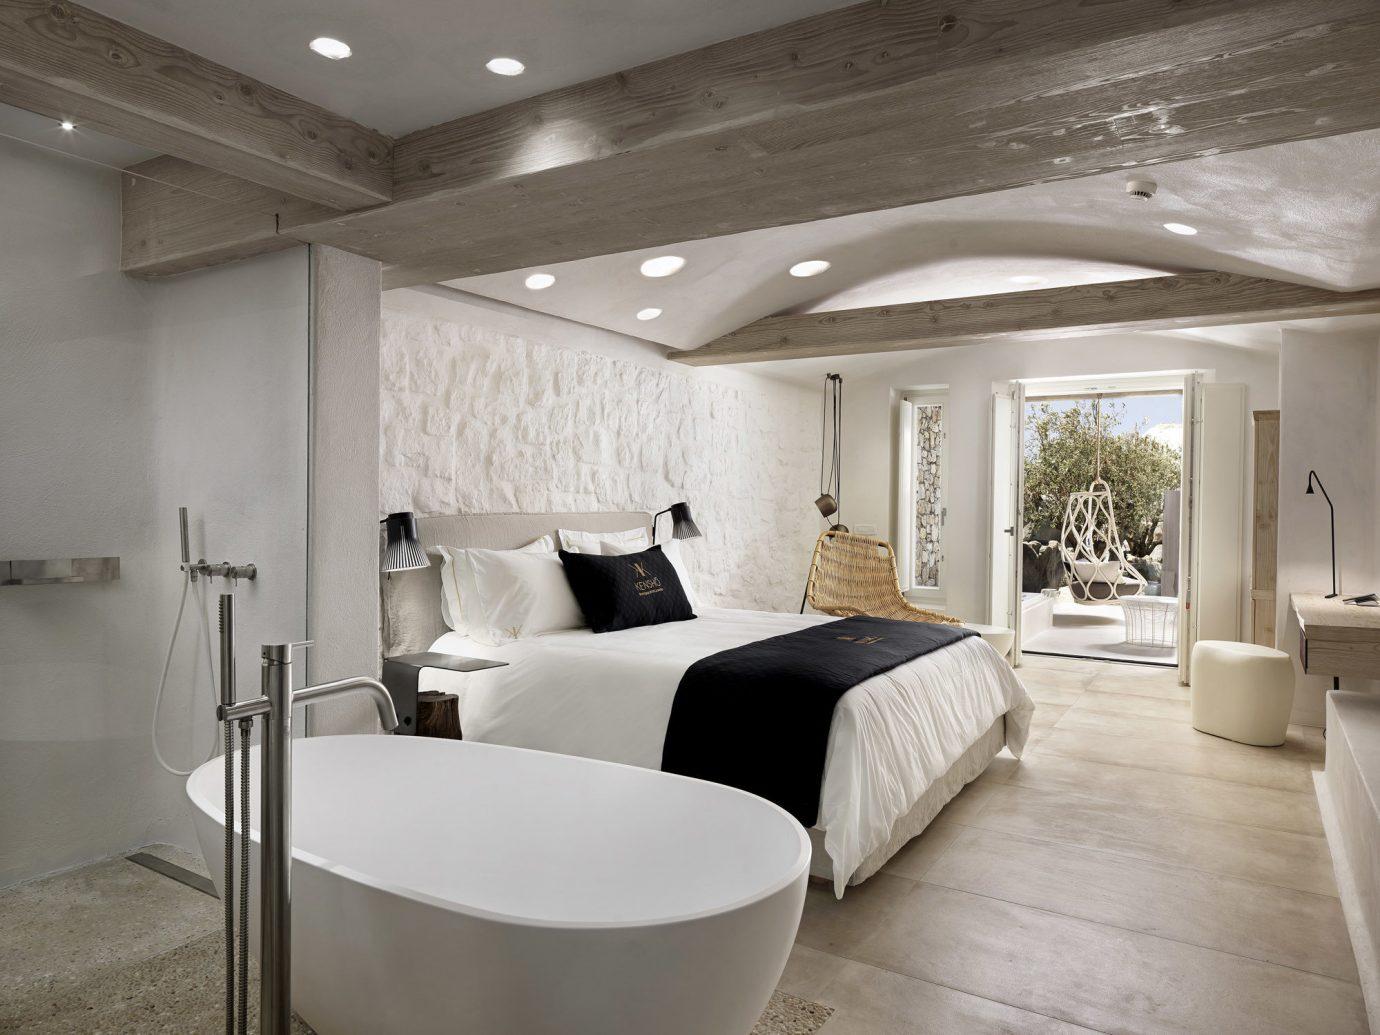 Hotels indoor ceiling floor wall room property house estate interior design living room home Design daylighting hotel furniture Bedroom several